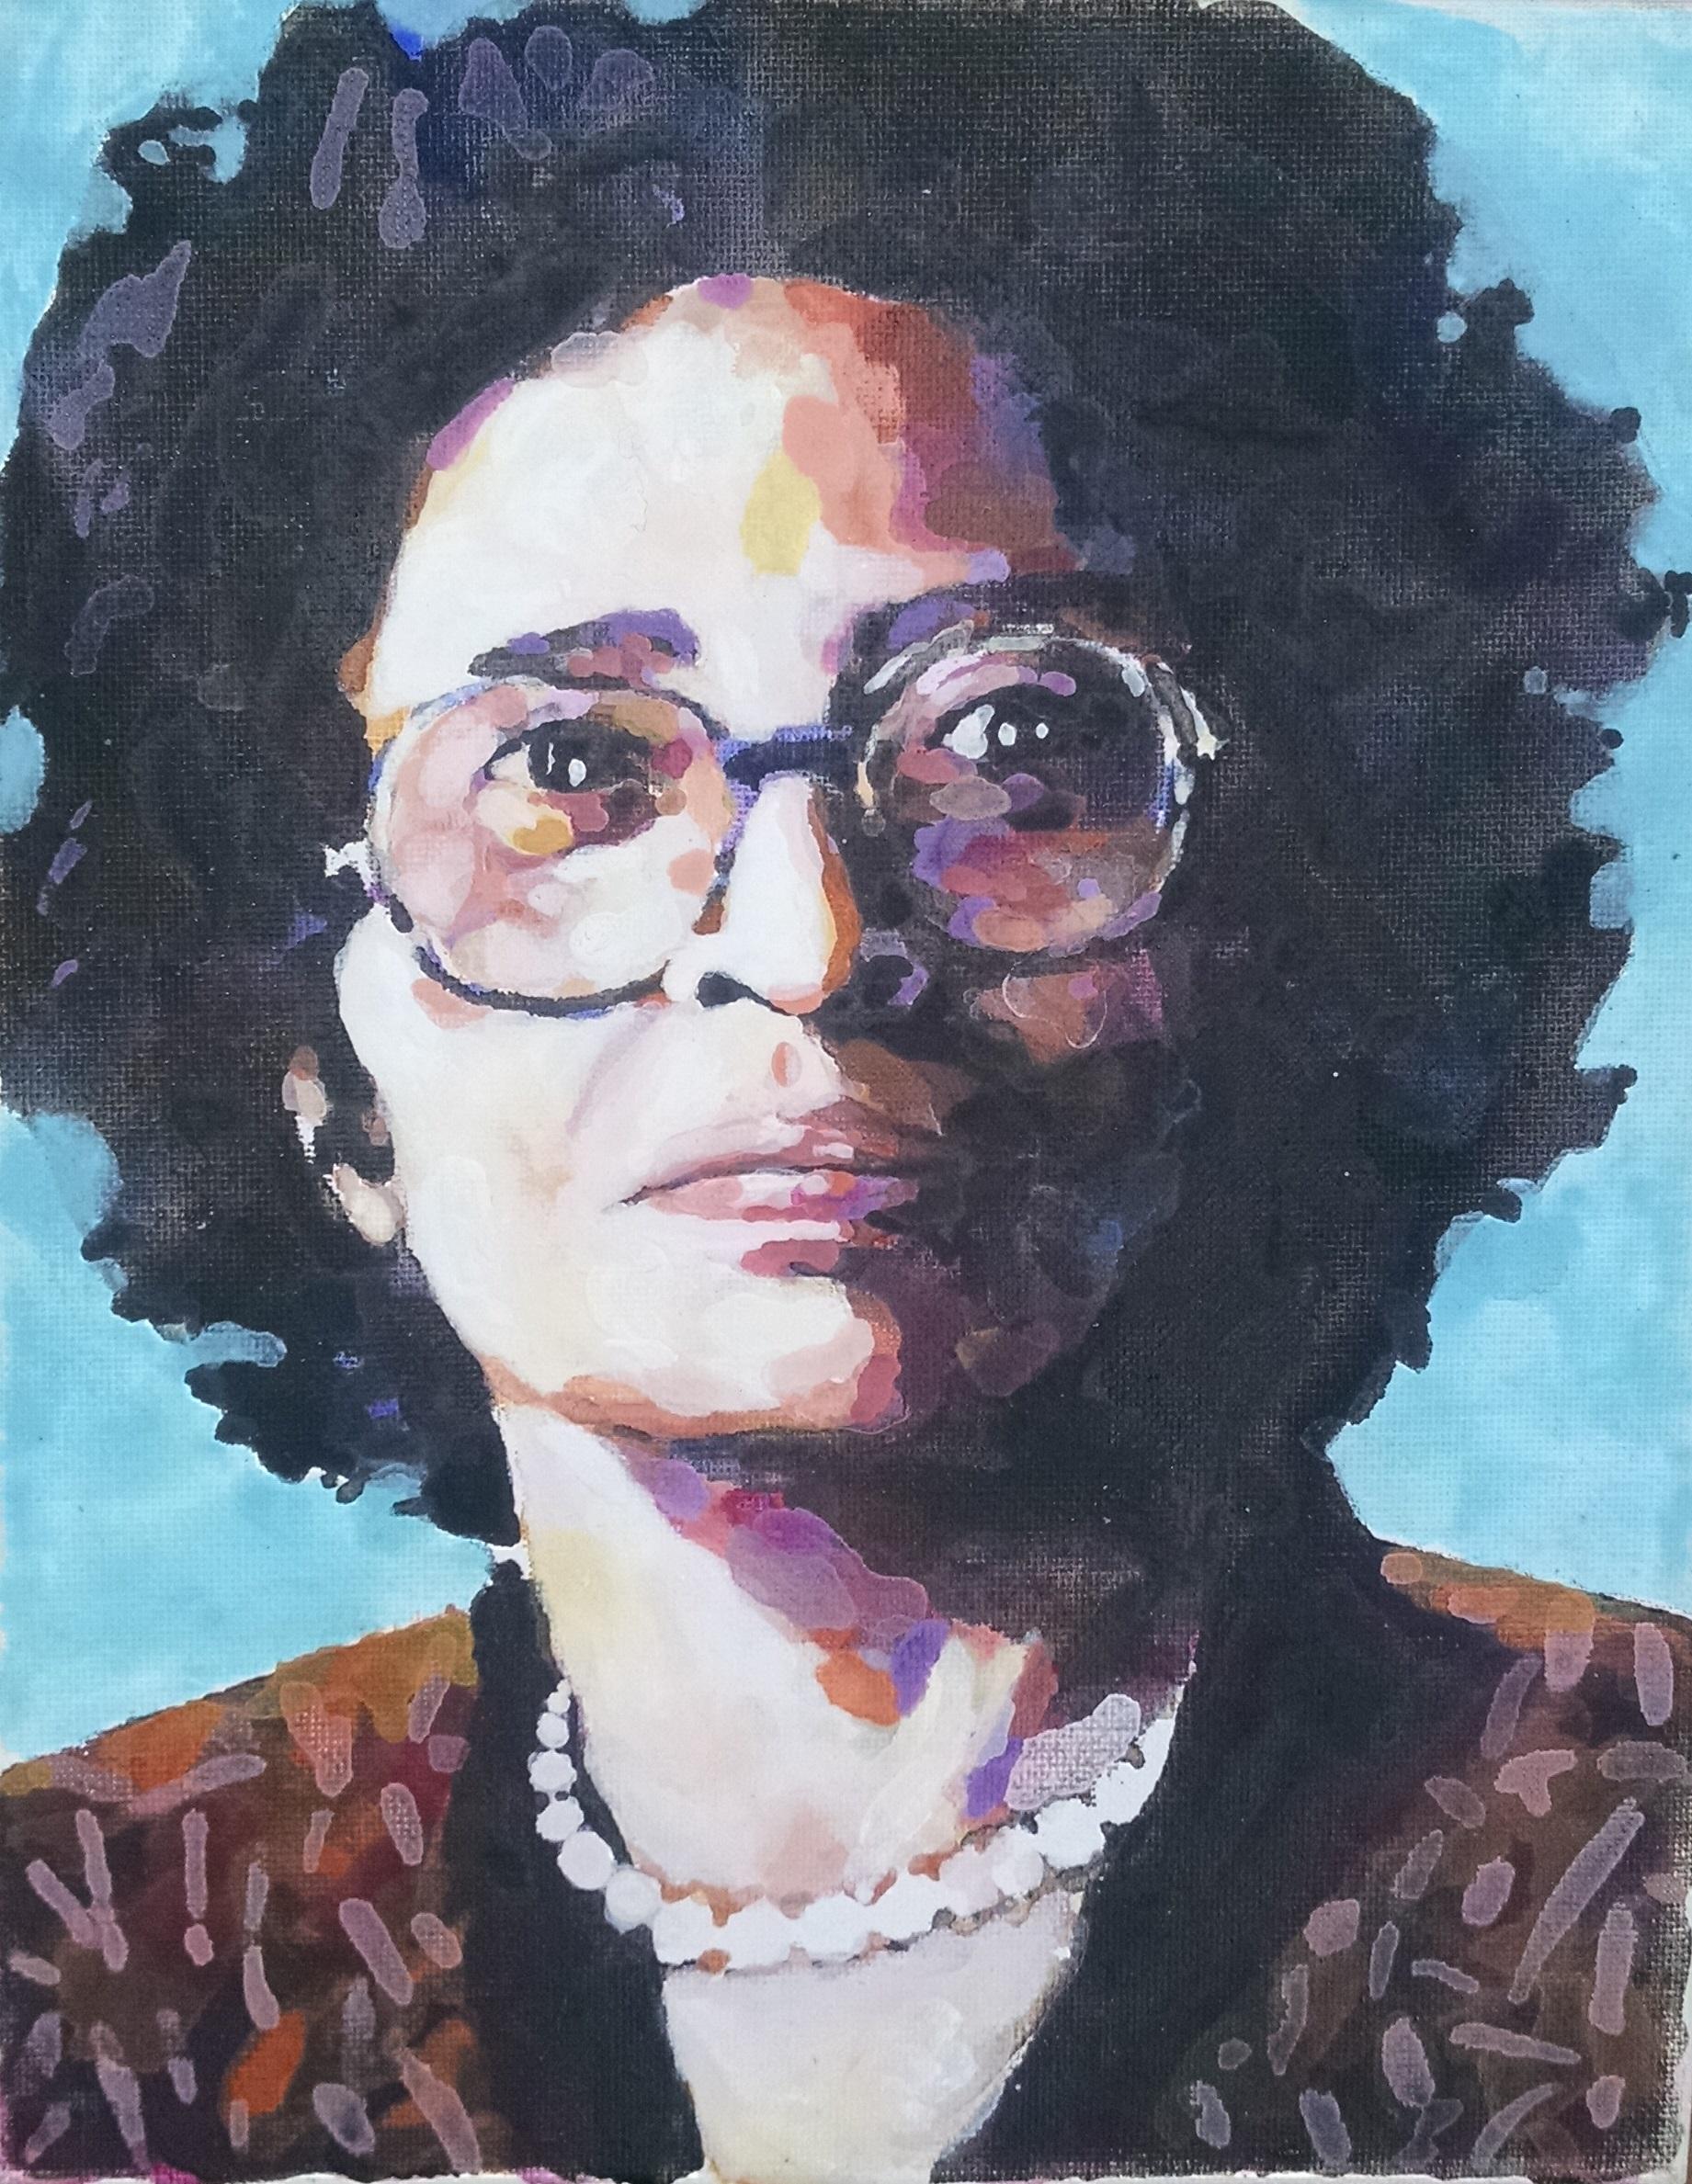 Mrs. Daisey Bates, the courageous civl rights activist